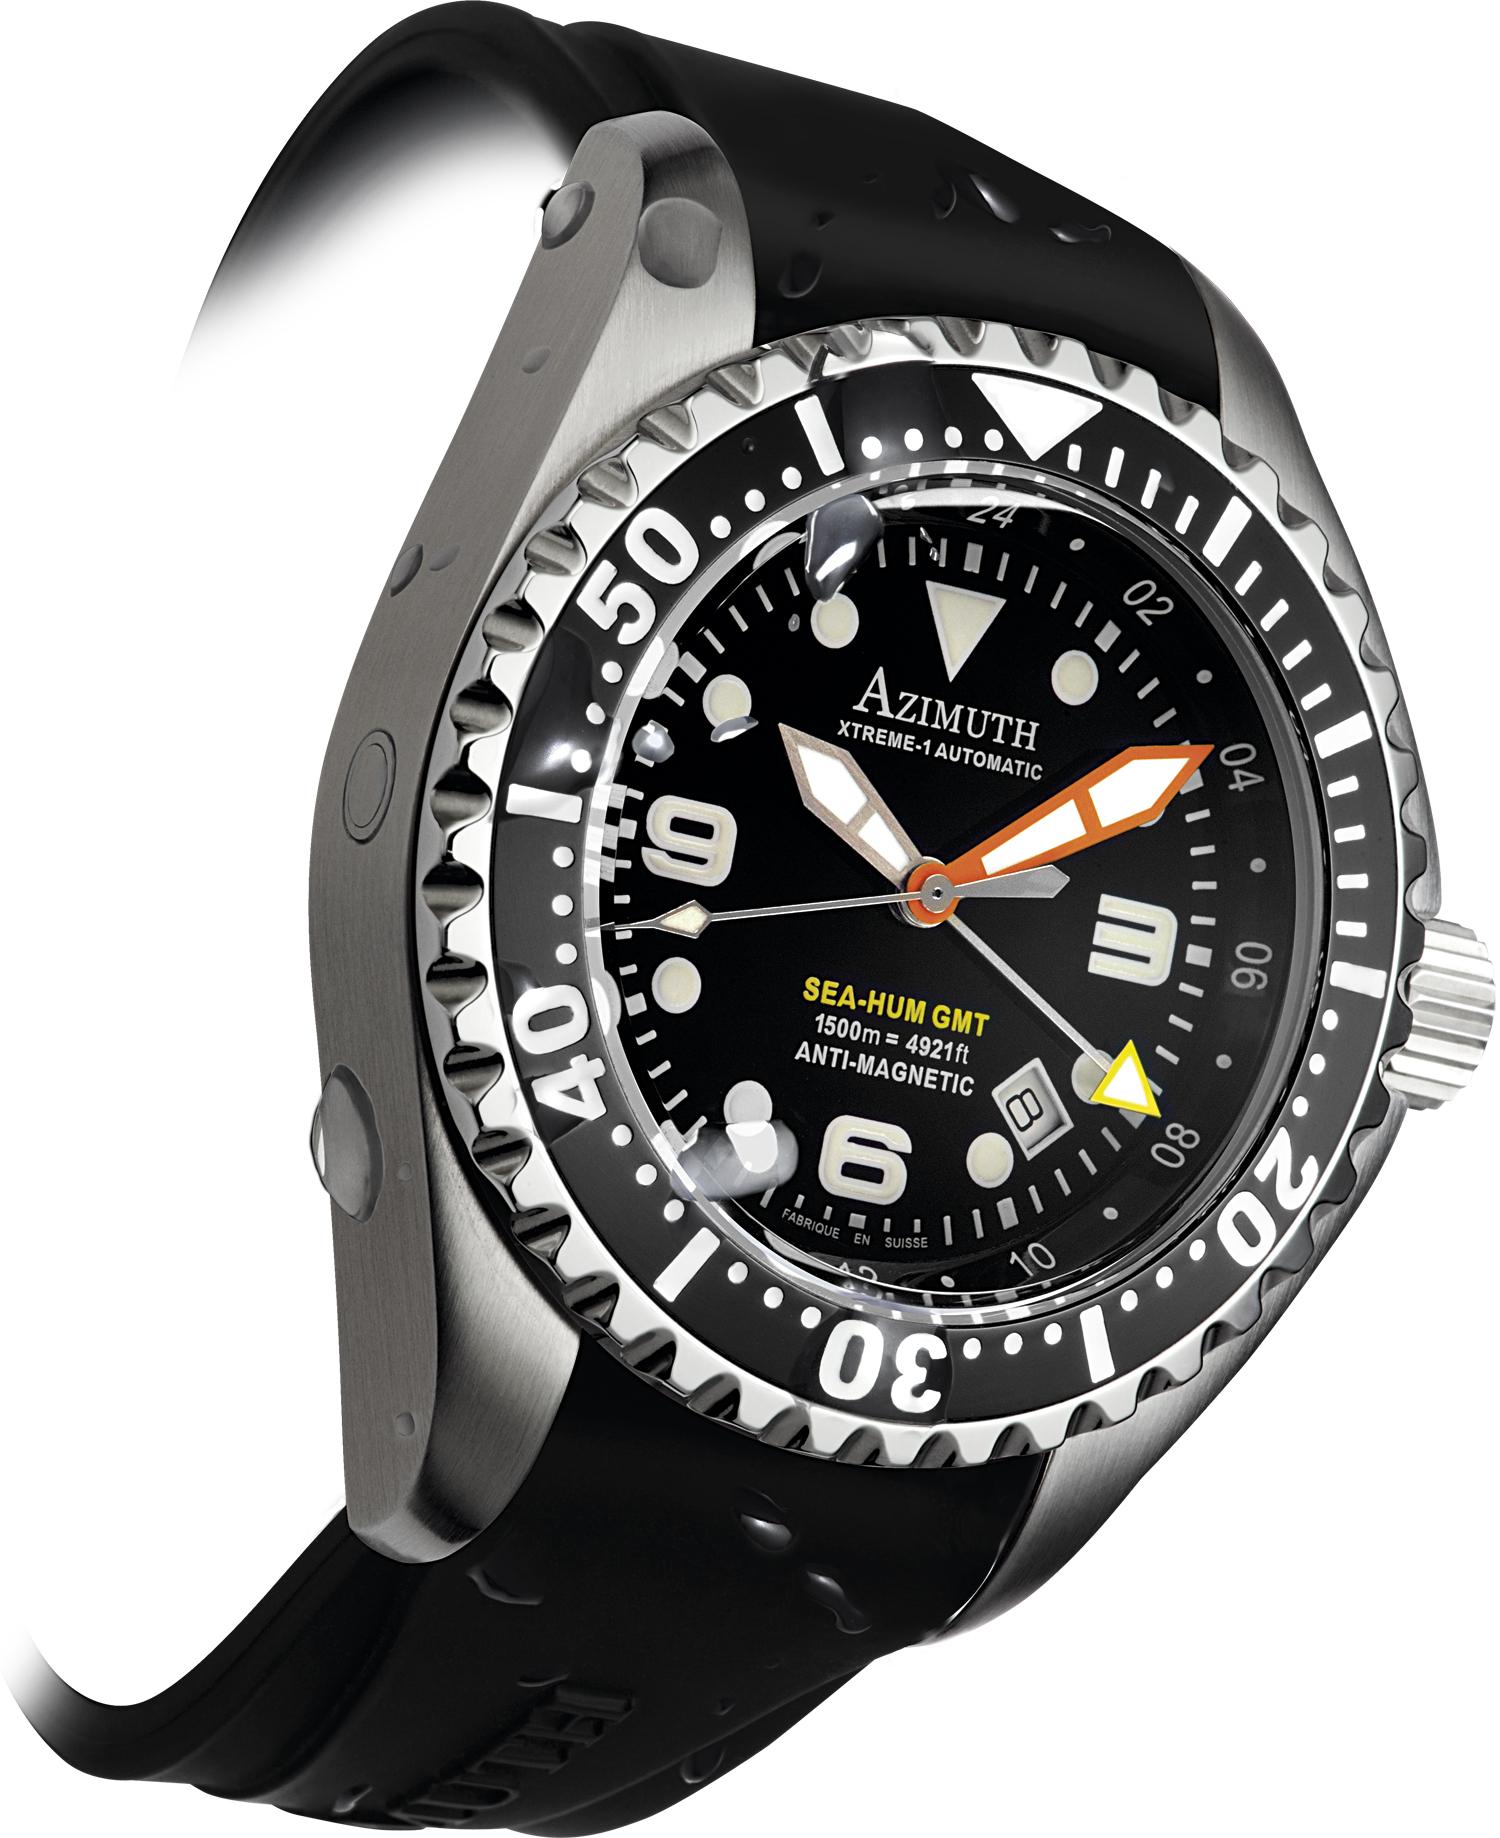 Sea-Hum 3TZ (Black dial)